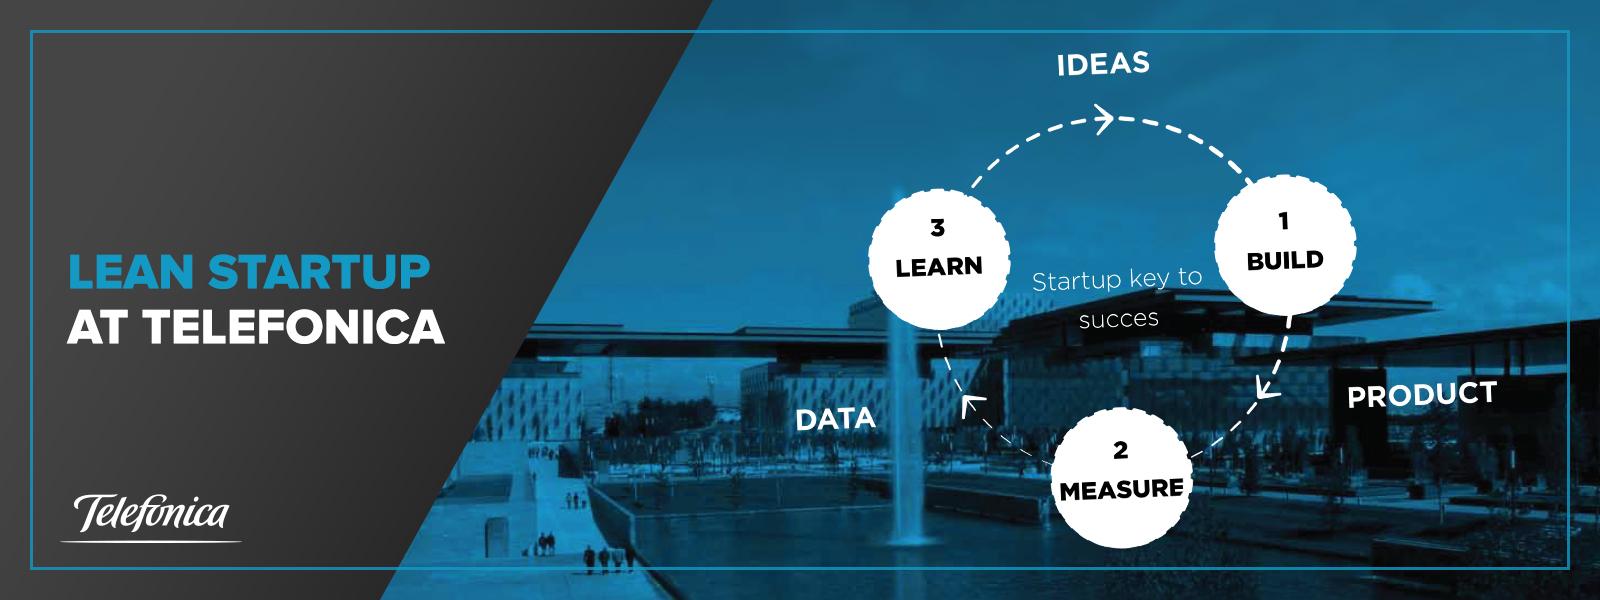 LAA-Blog---1.9.2-Telefonica-Lean-Startup